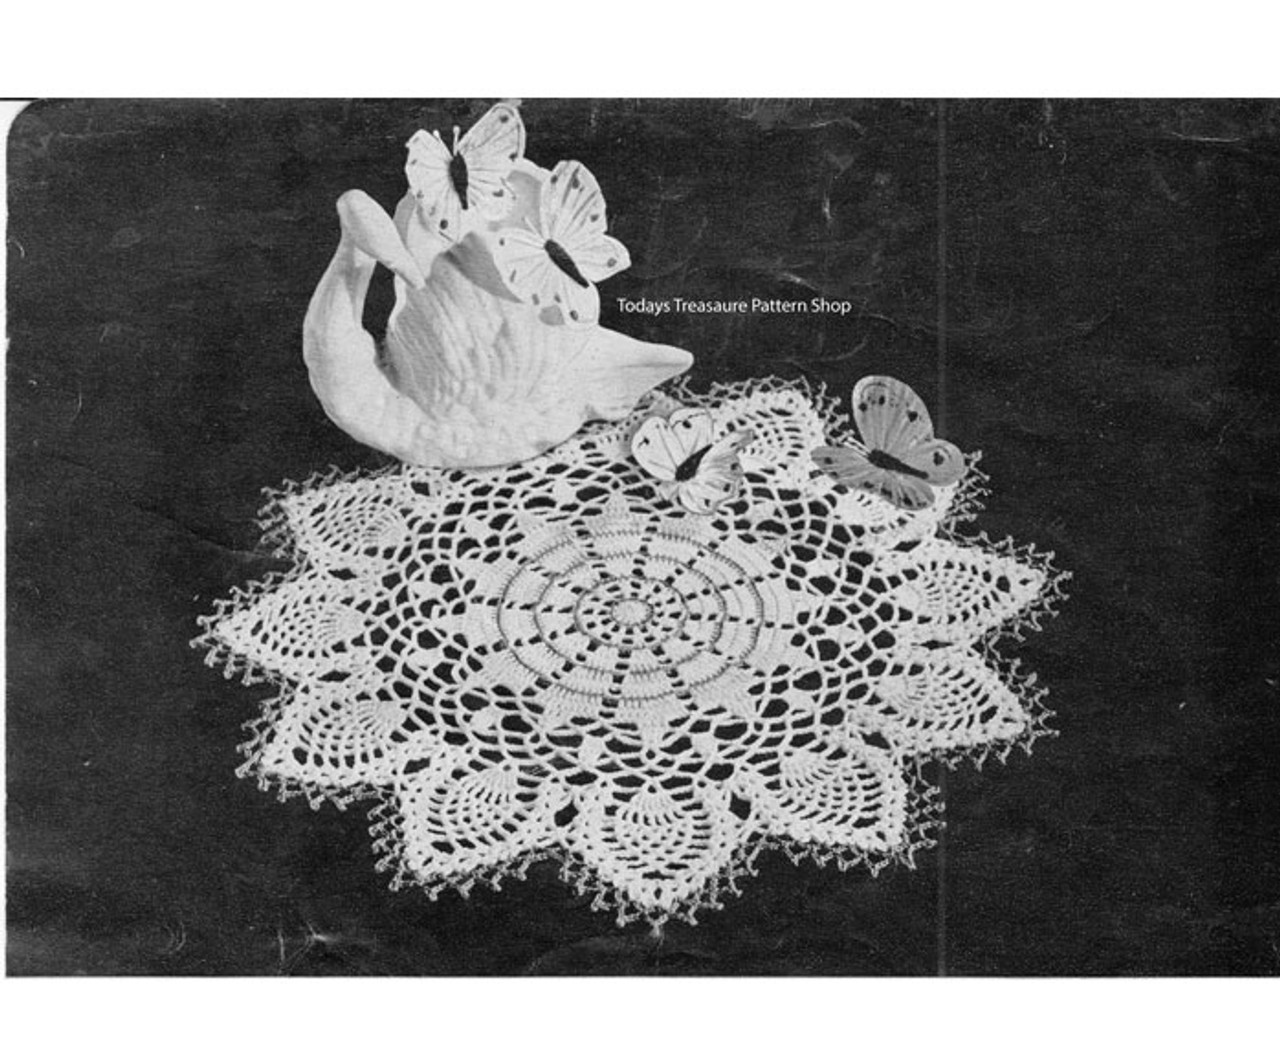 Vintage Crocheted Swan Doily Pattern